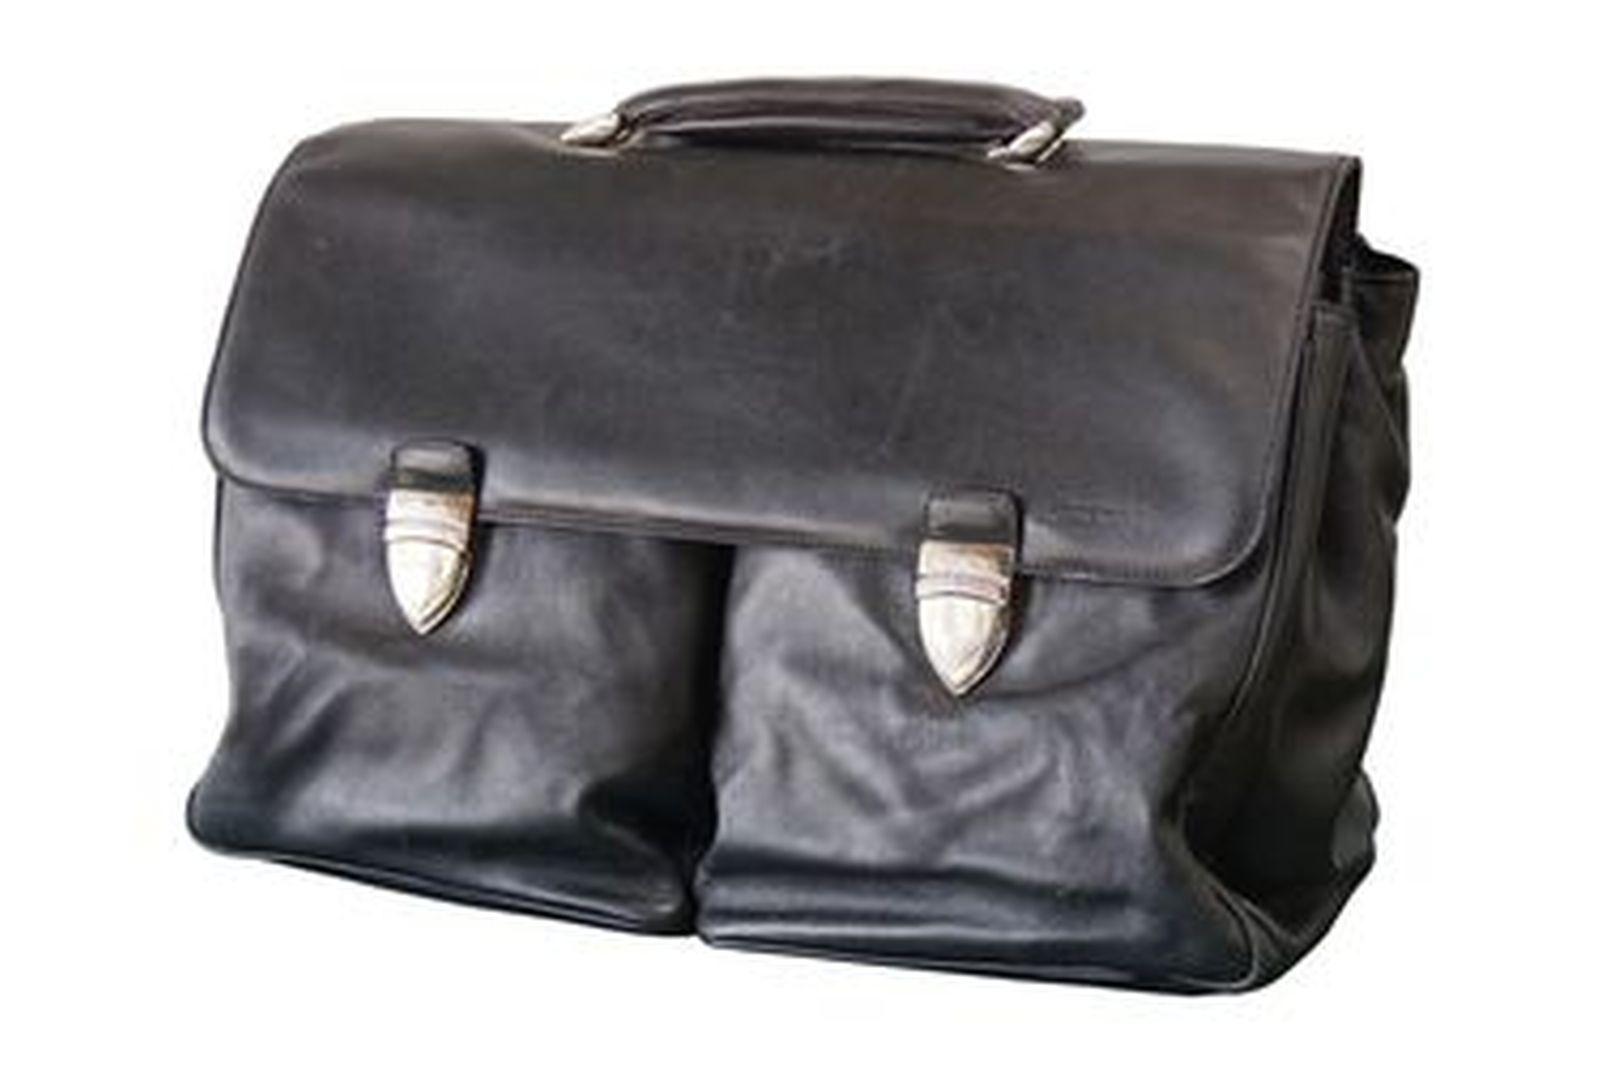 Brief Case - Lamborghini Black Leather Brief Case